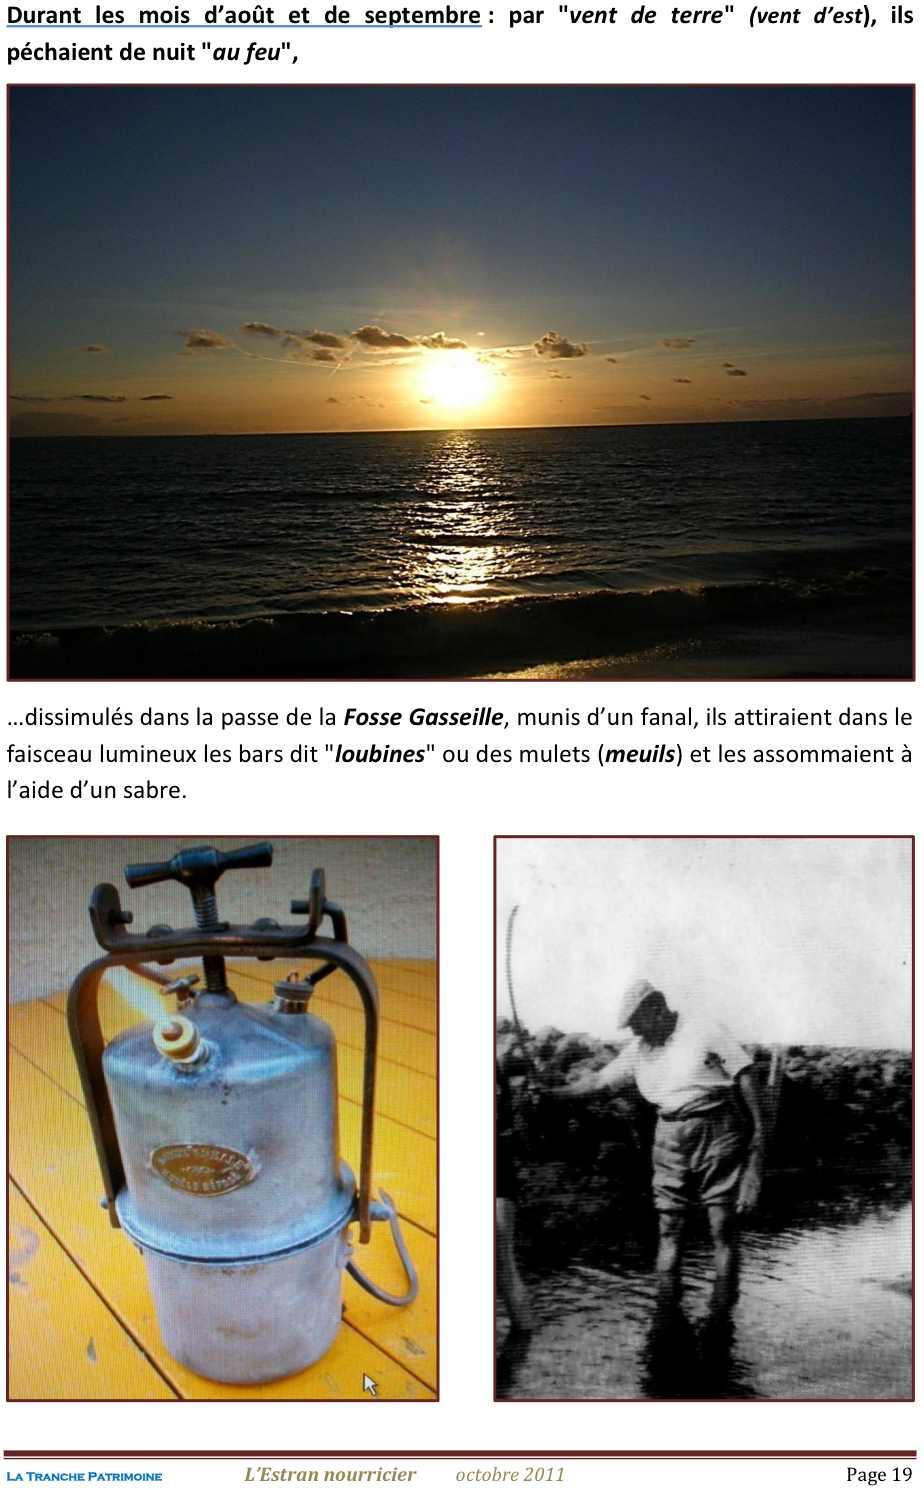 Lestran Nourricier 19 jpeg1.jpg